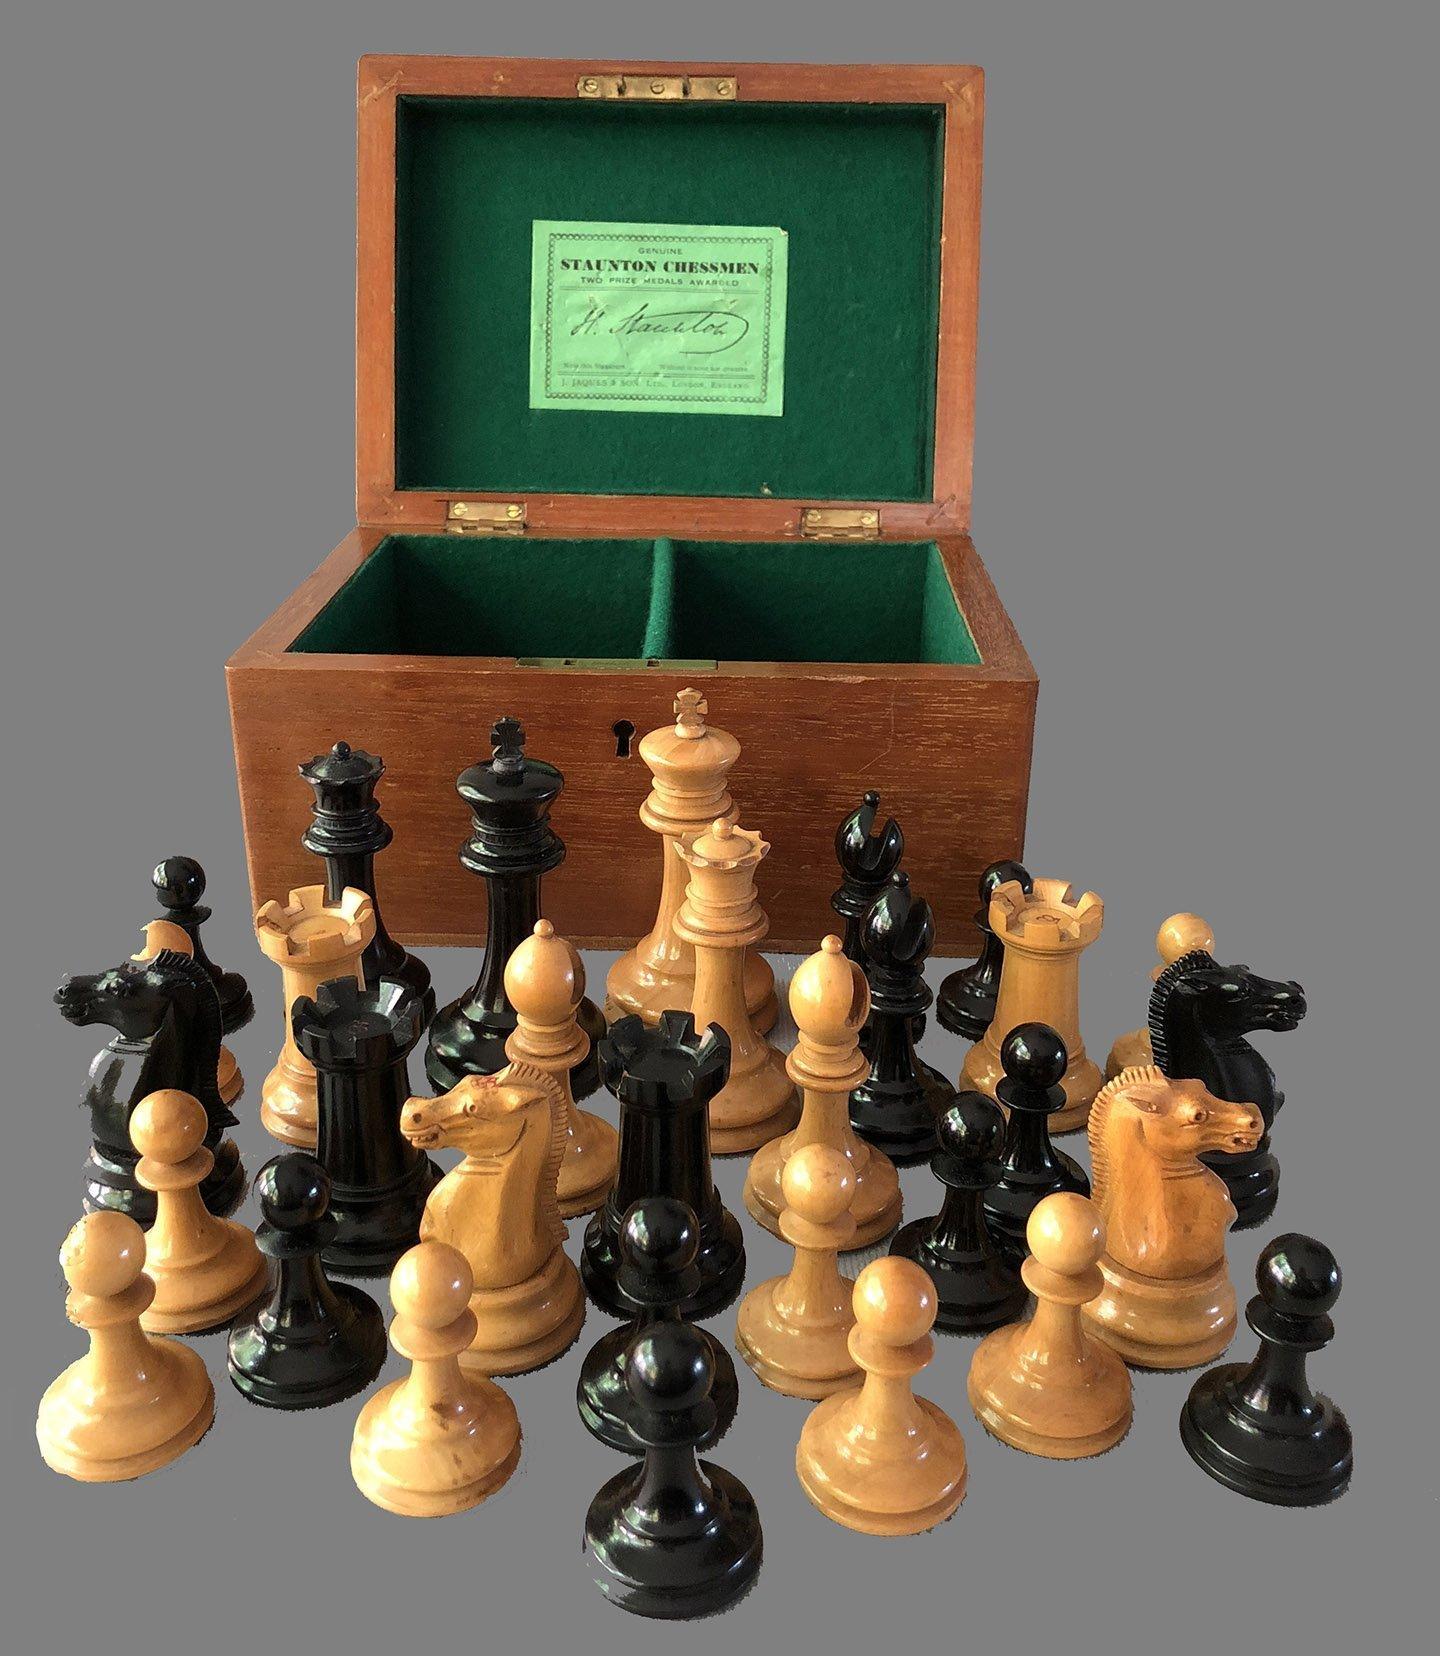 Jaques Tournament Zukertort Chessmen